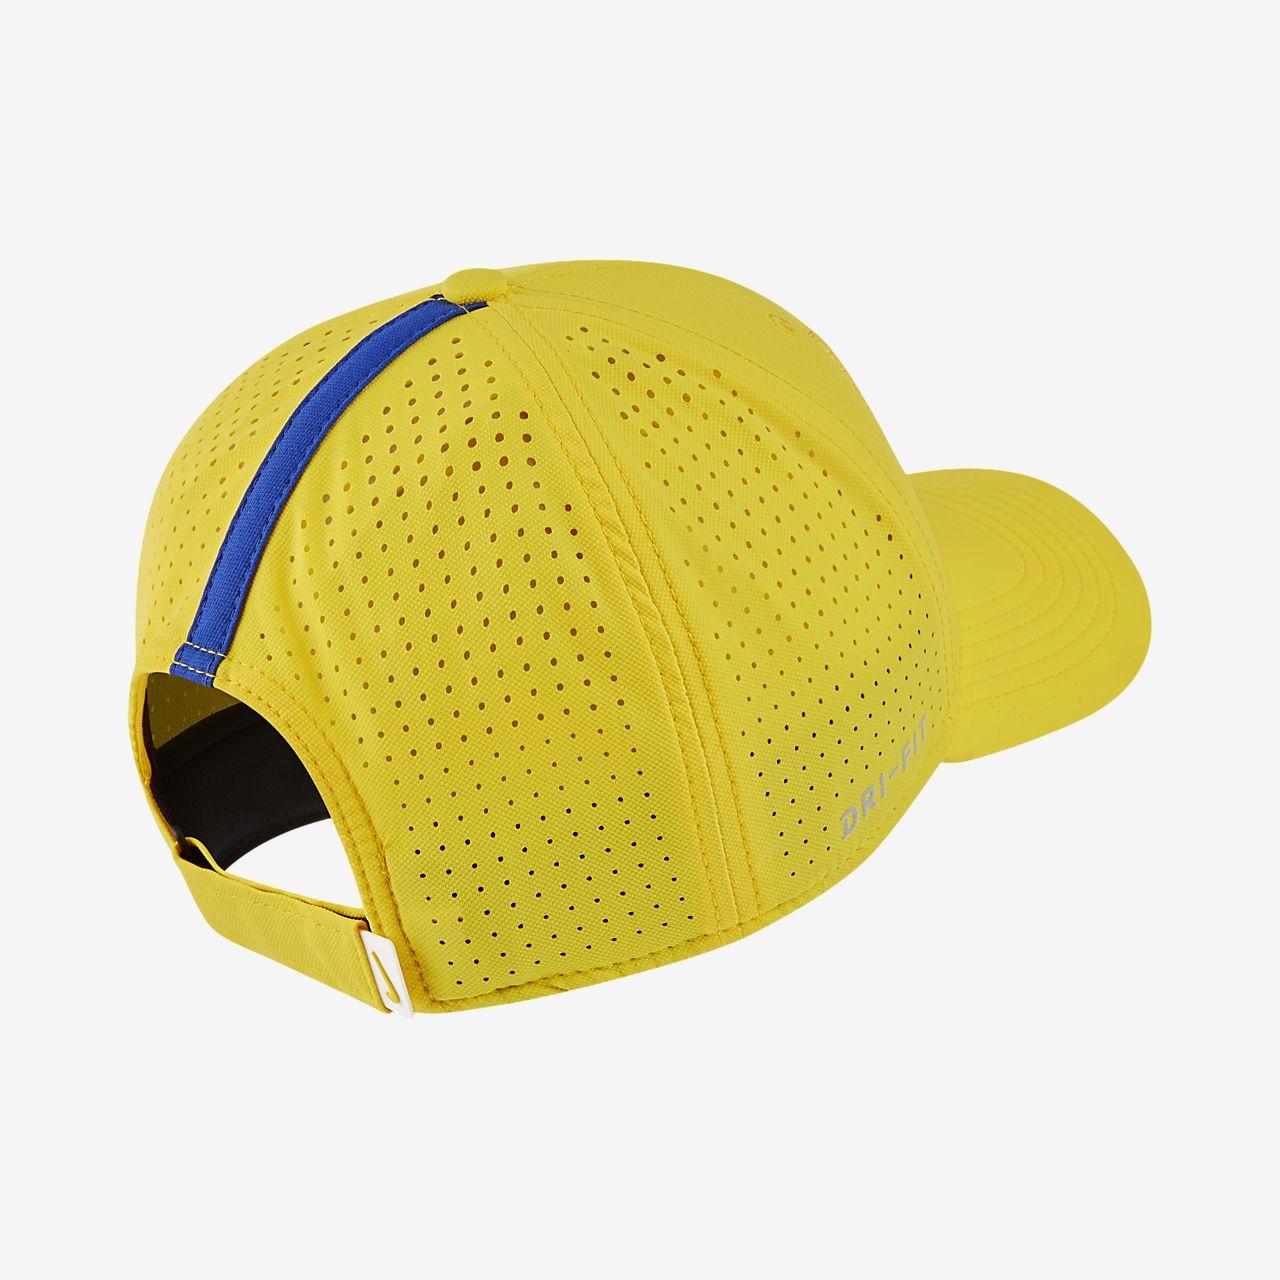 e54f4217b7c Low Resolution Chelsea FC AeroBill Classic99 Adjustable Hat Chelsea FC  AeroBill Classic99 Adjustable Hat